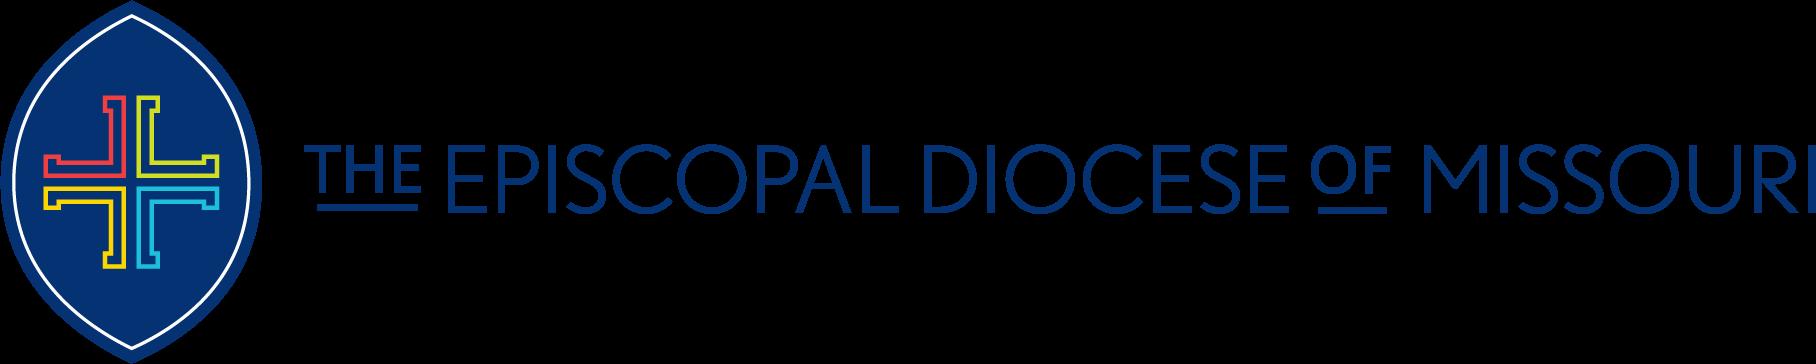 episcopaldiocese-mo-horz-rgb_35